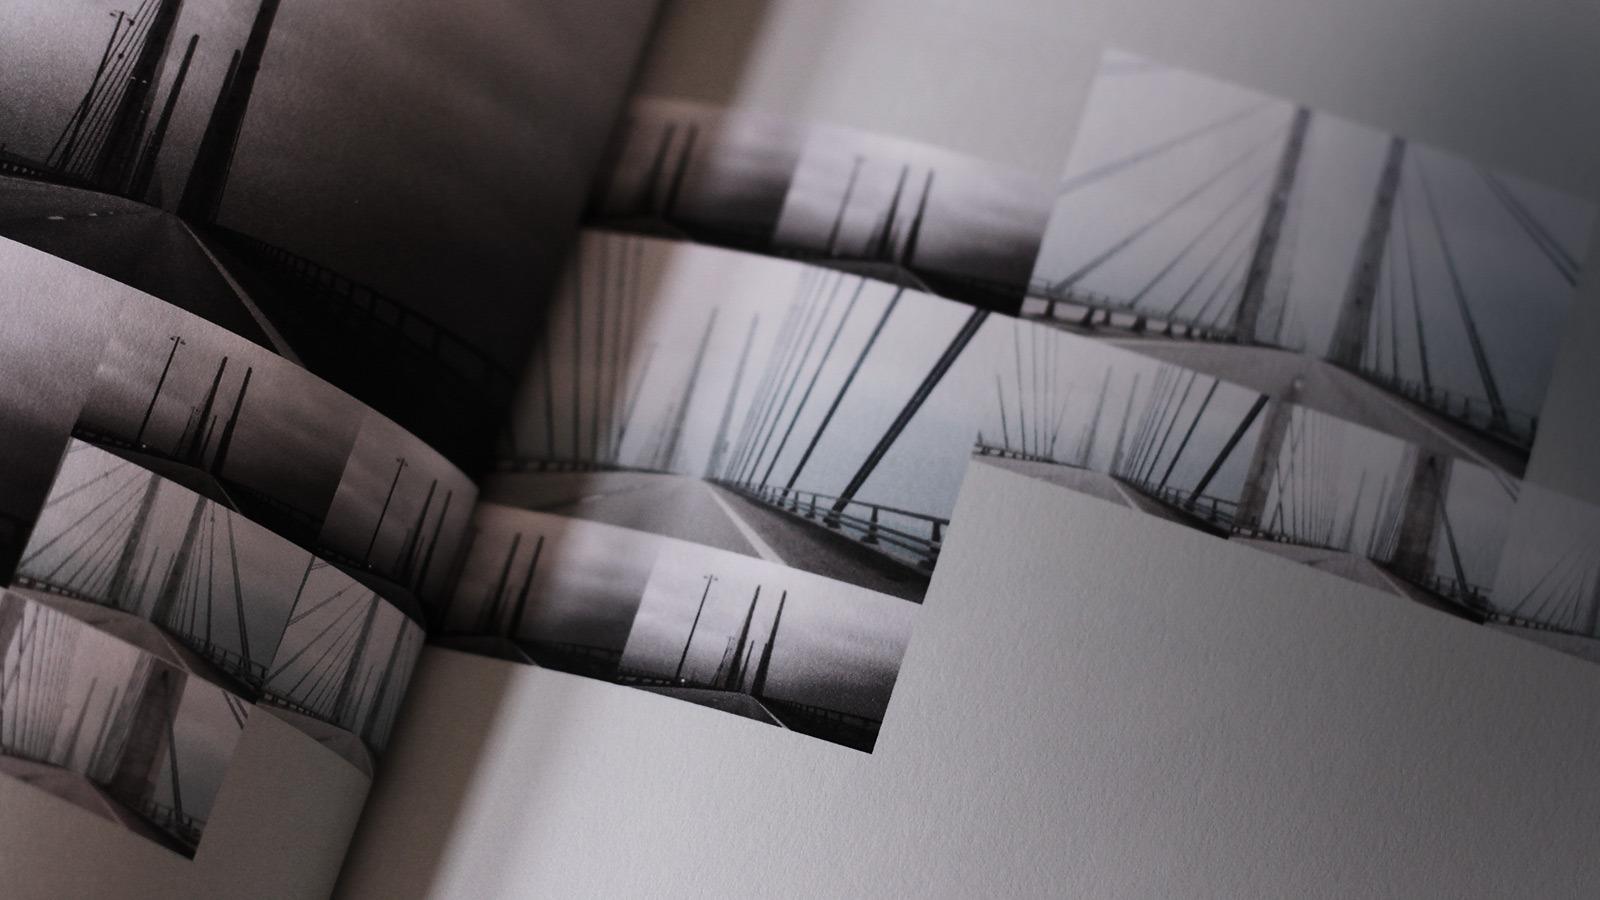 SVERIGE TID NO.1 - Buch-Design